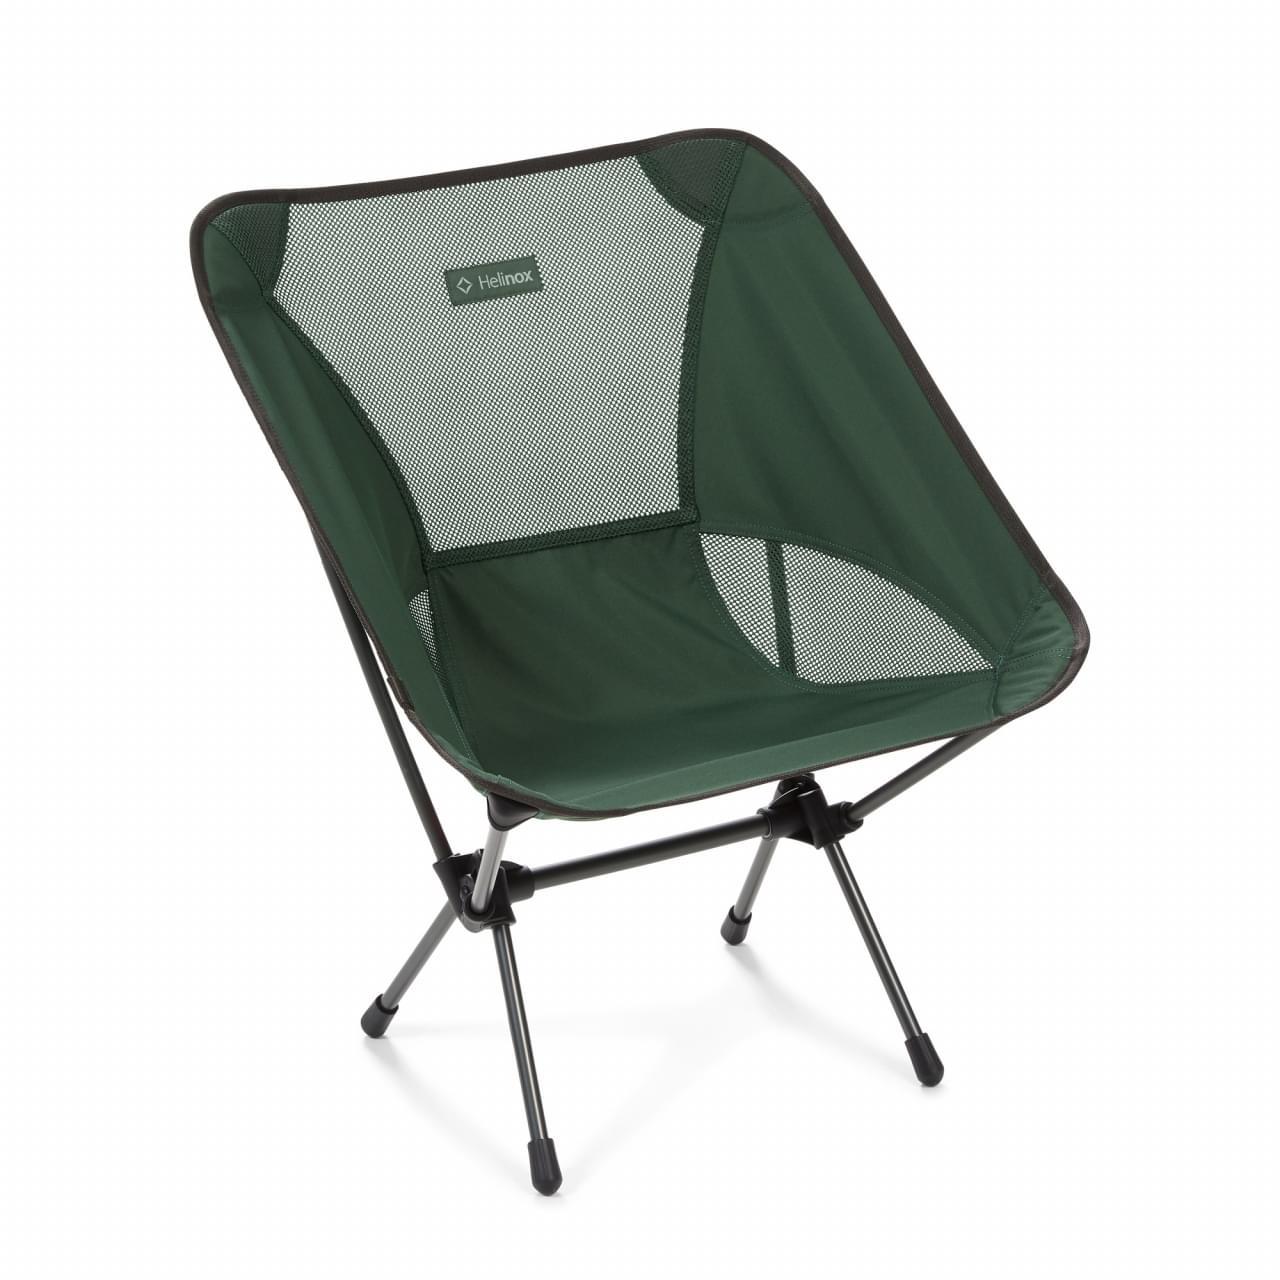 Helinox Chair One Lichtgewicht Stoel - Groen